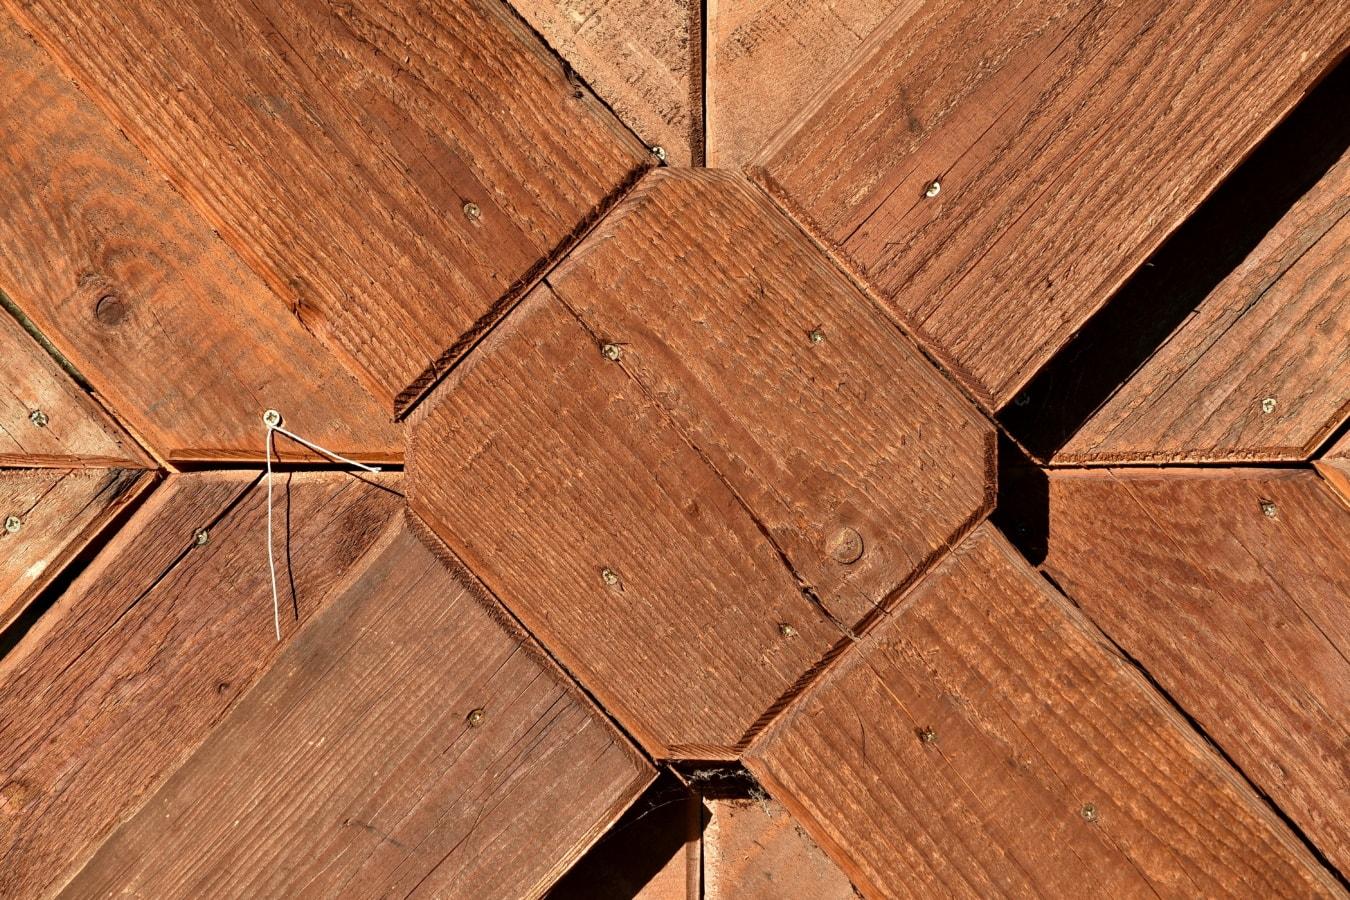 design, oak, texture, cube, carpentry, wood, light brown, rough, parquet, hardwood